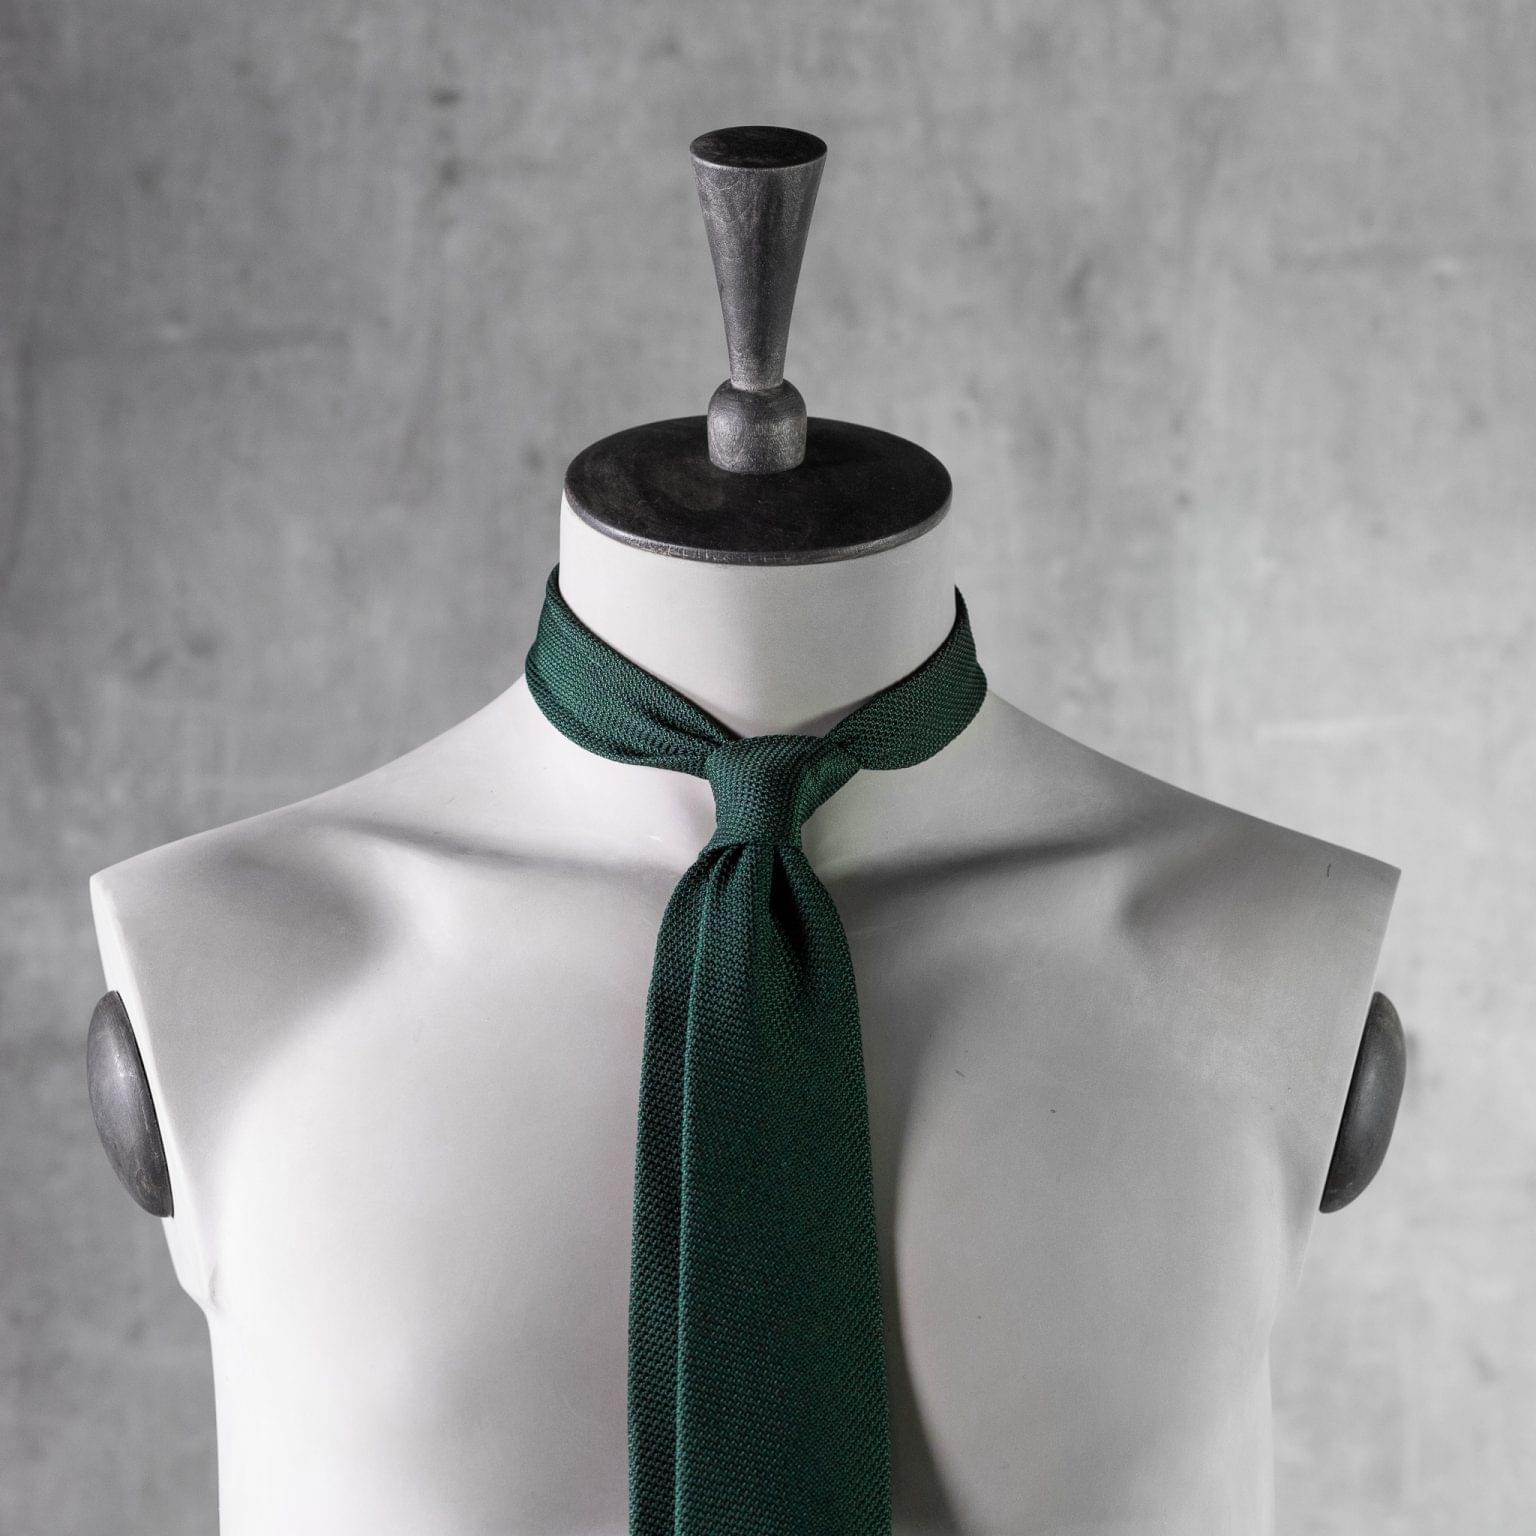 GRENADINE-0148-Tie-Initials-Corbata-Iniciales-The-Seelk-3